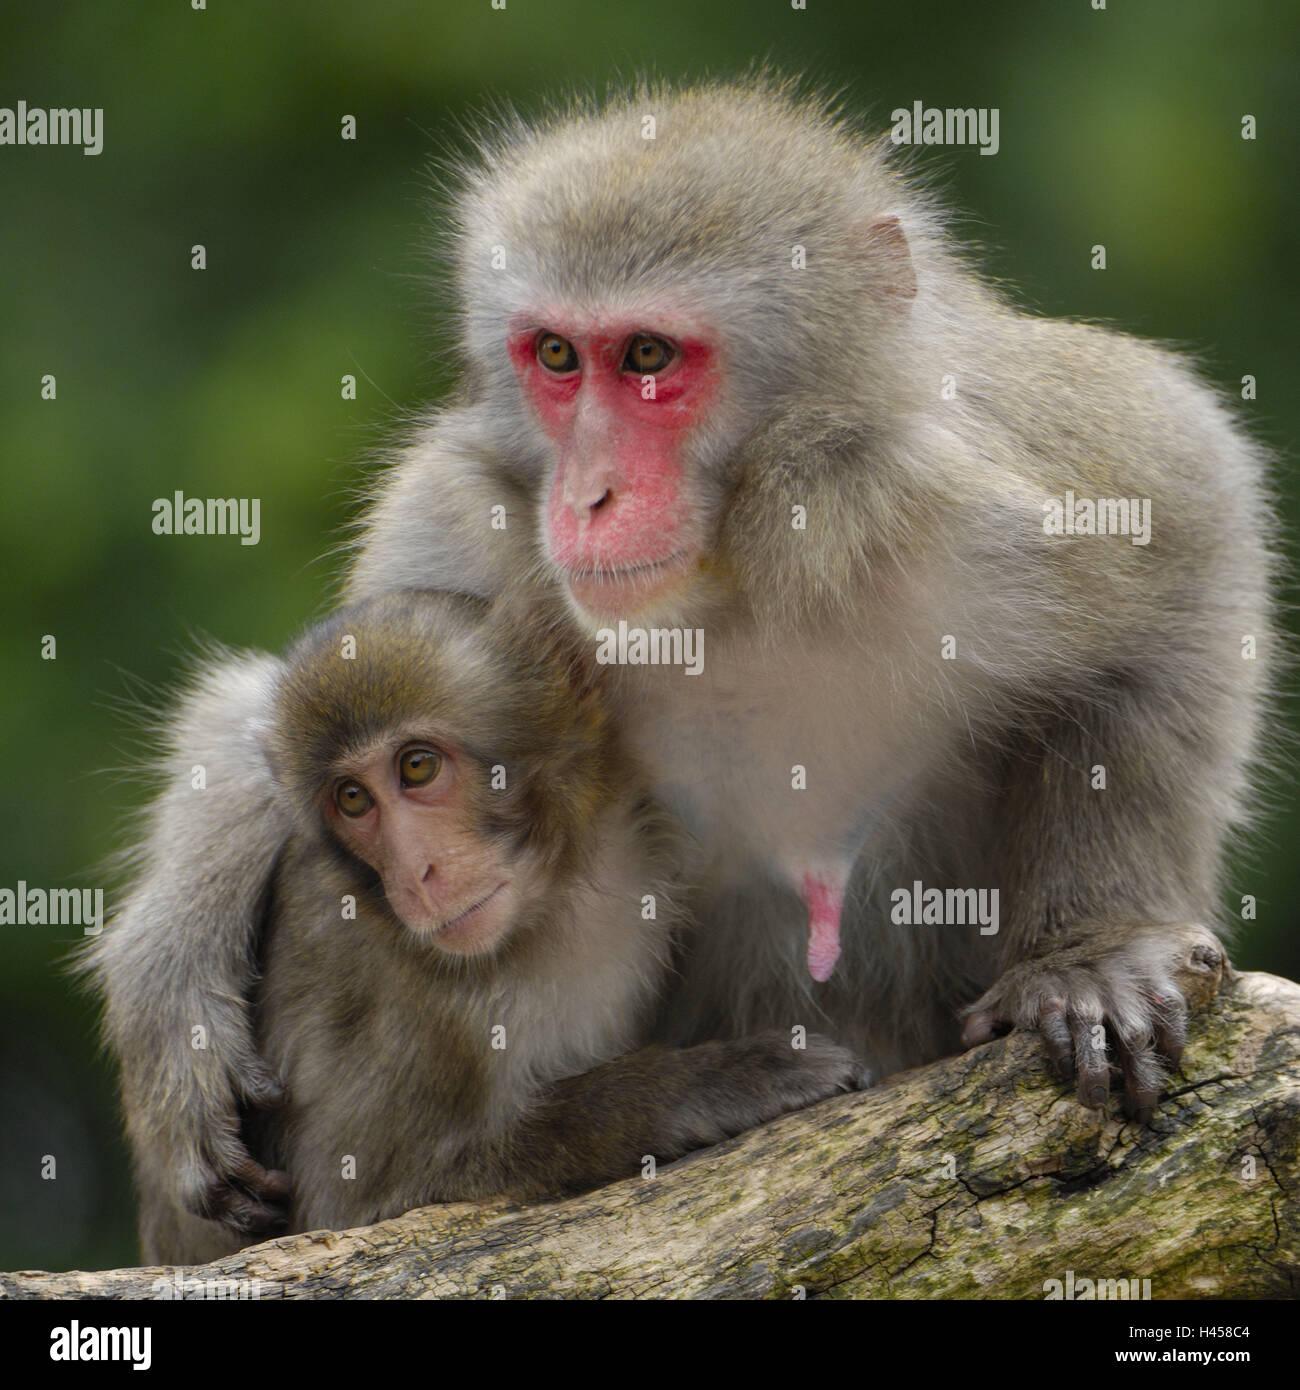 Japanese Macaque Makaka Fuscata Mother Animal Young Animal Stock Photo Royalty Free Image